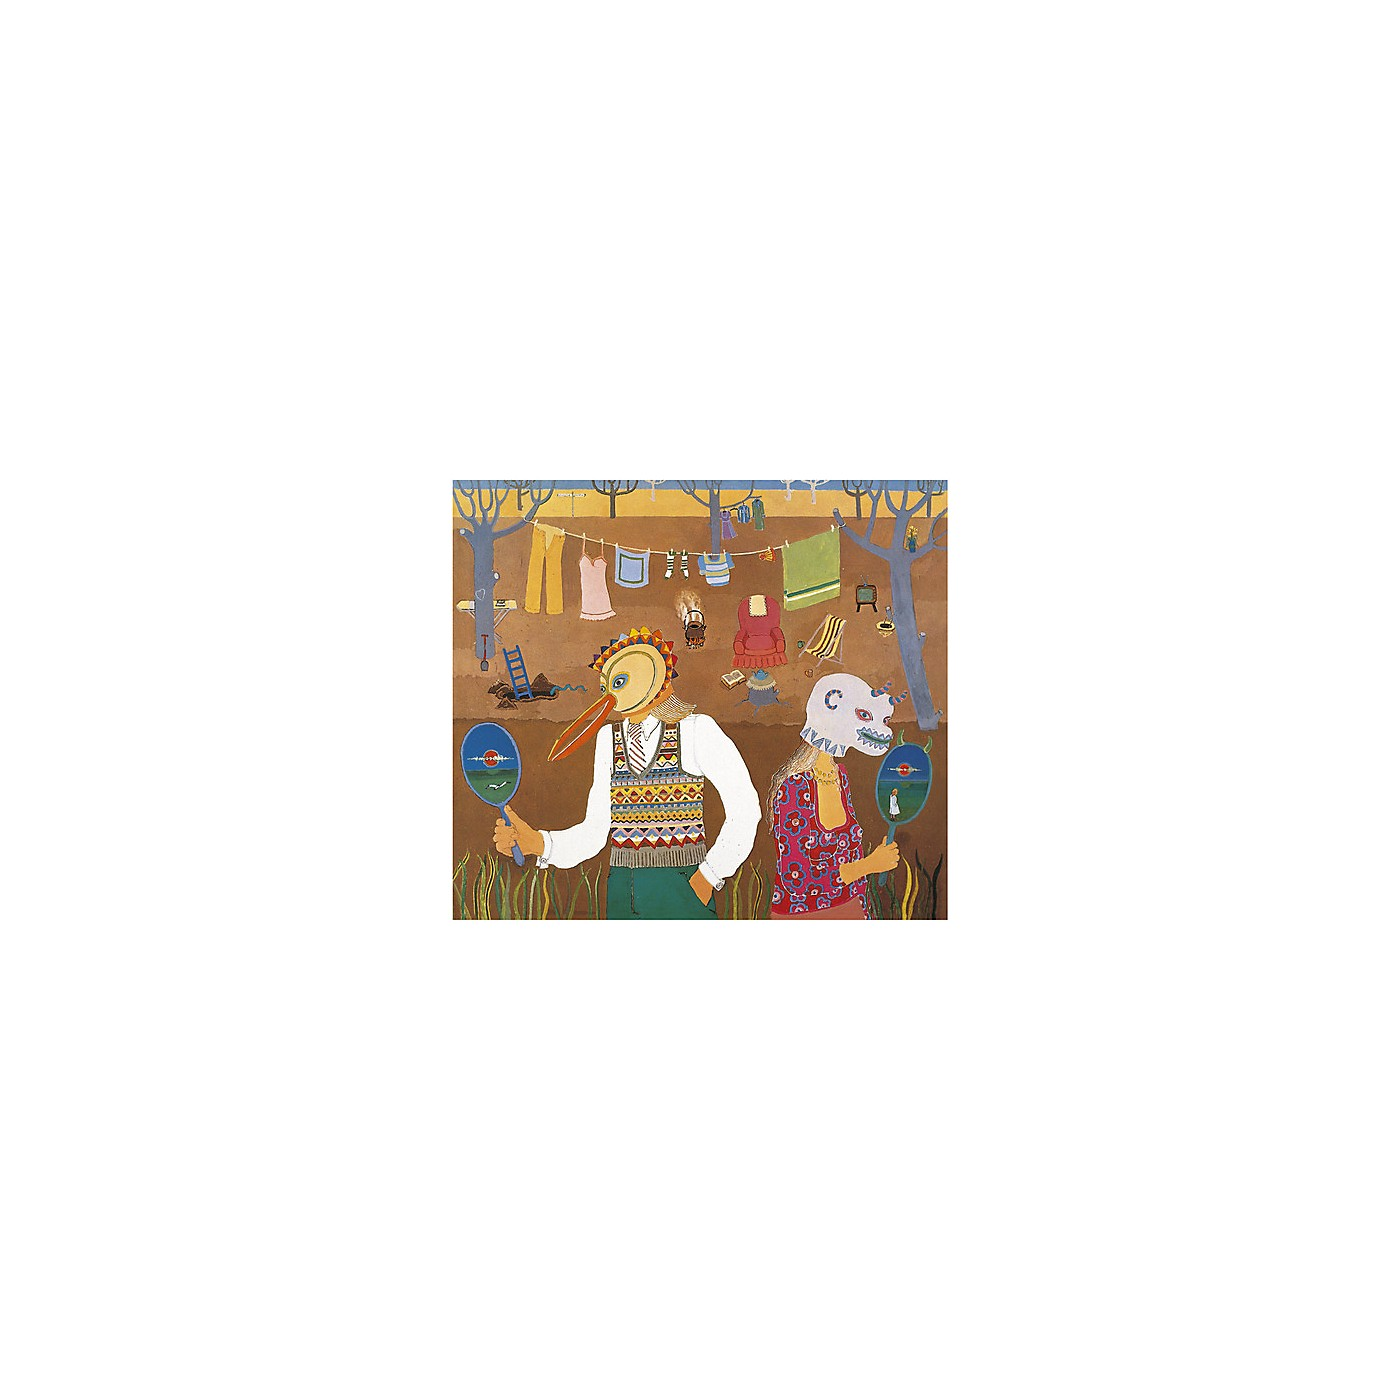 Alliance Robert Wyatt - Ruth Is Stranger Than Richard [With CD] [Reissue] [Limited Edition] thumbnail